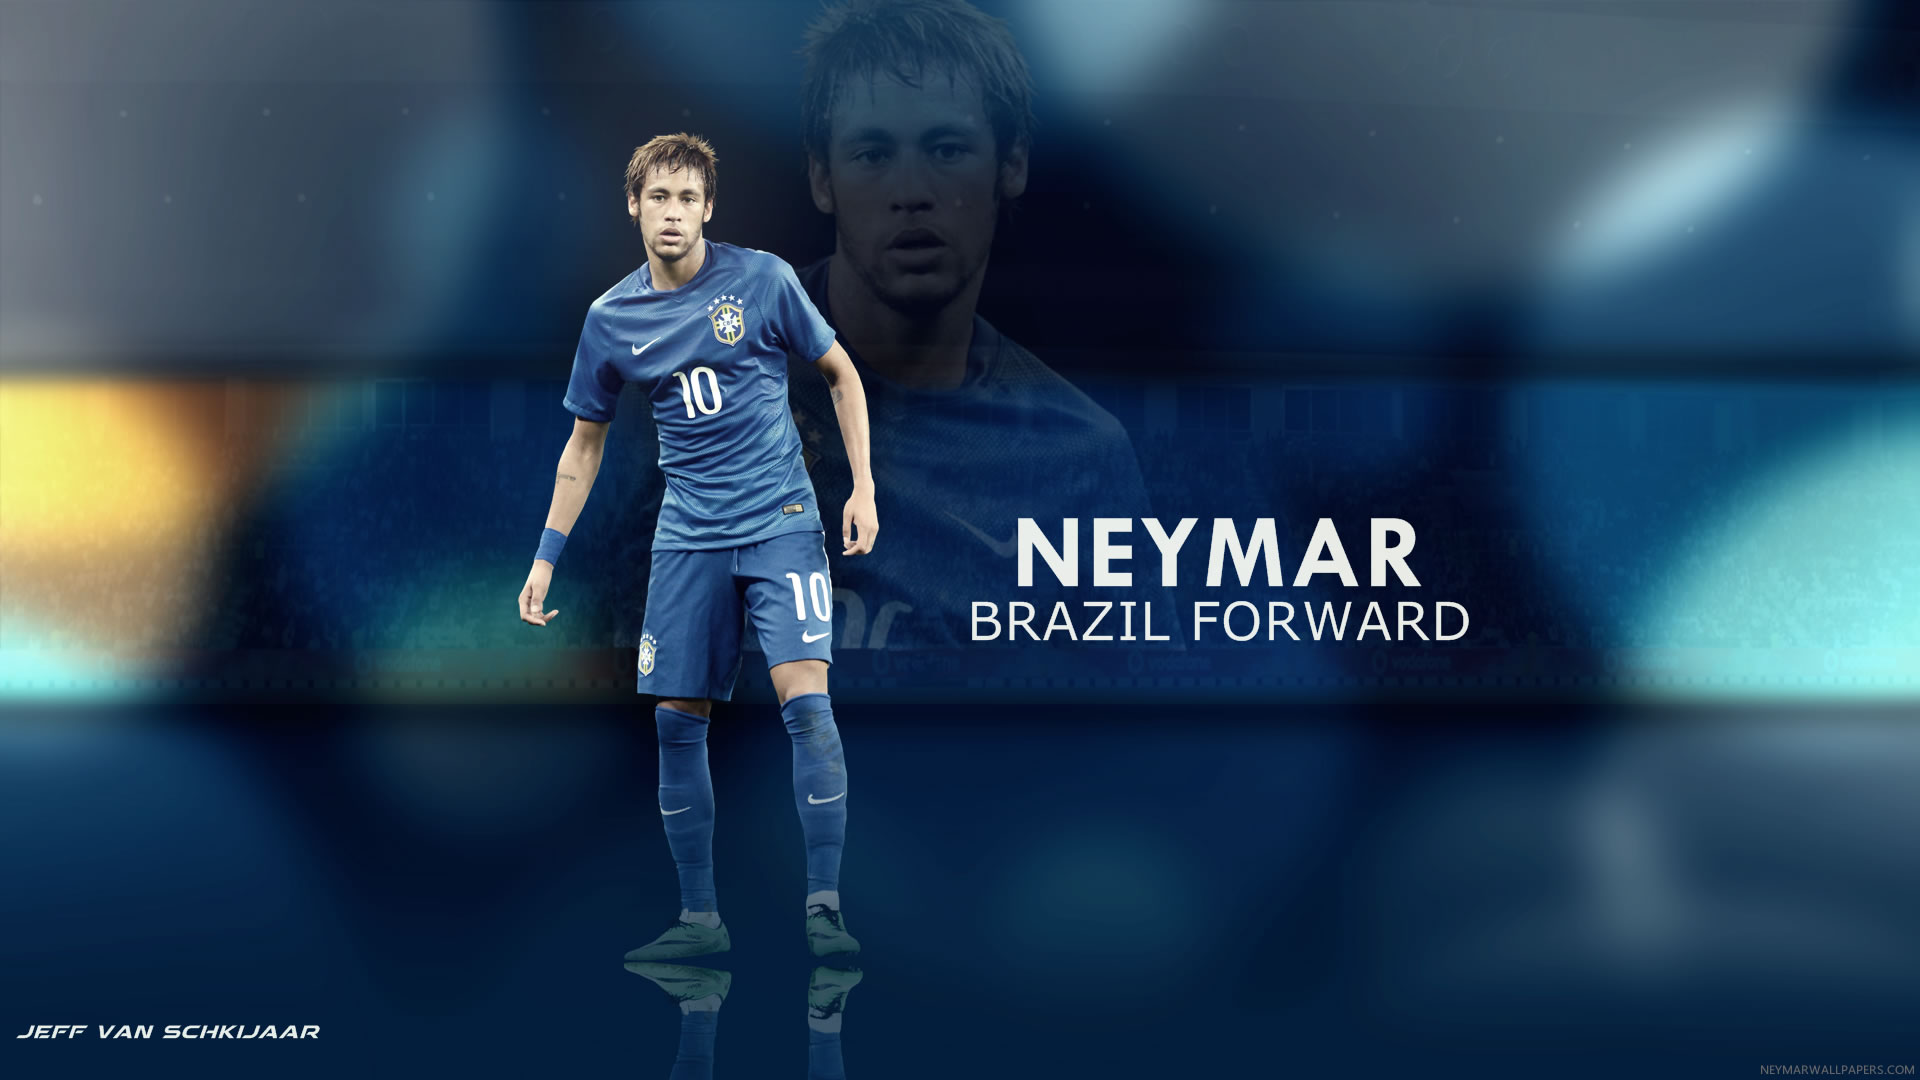 Neymar Brazil Forward wallpaper